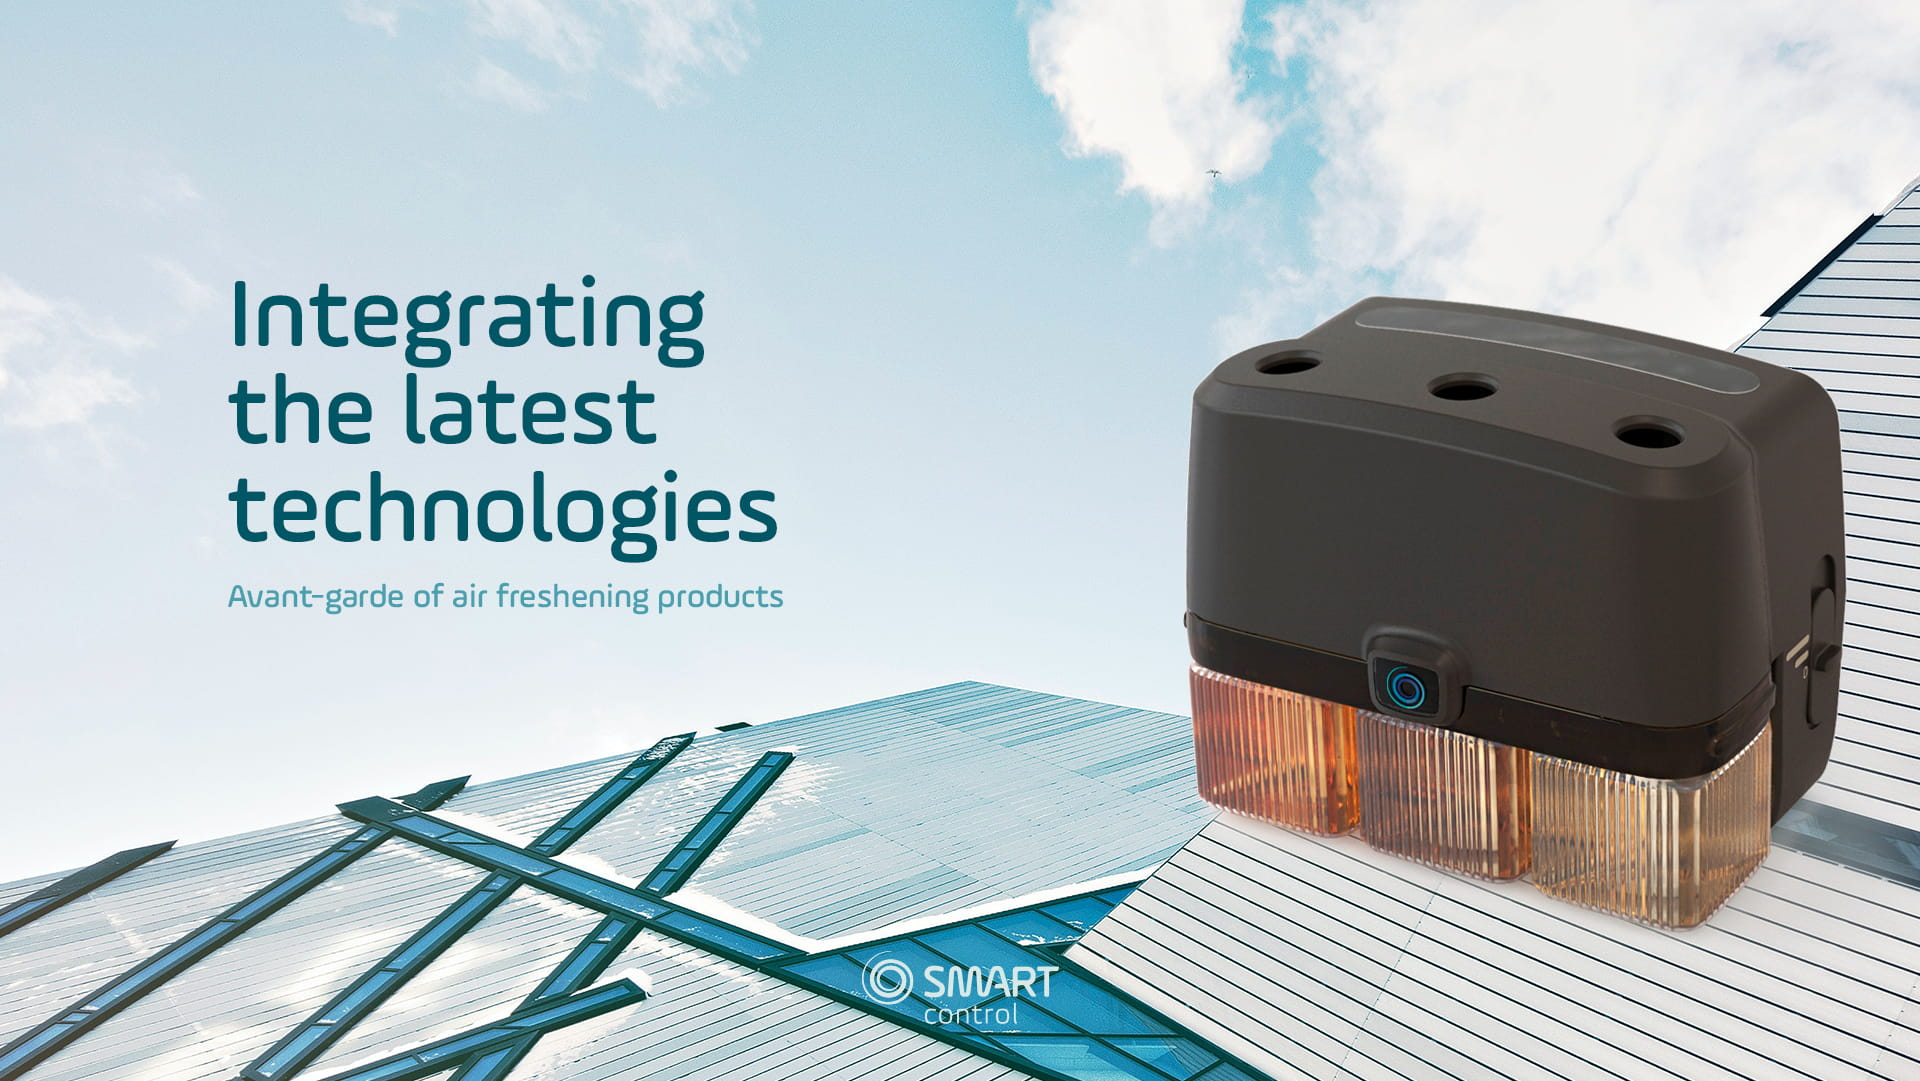 Integrating the latest technologies